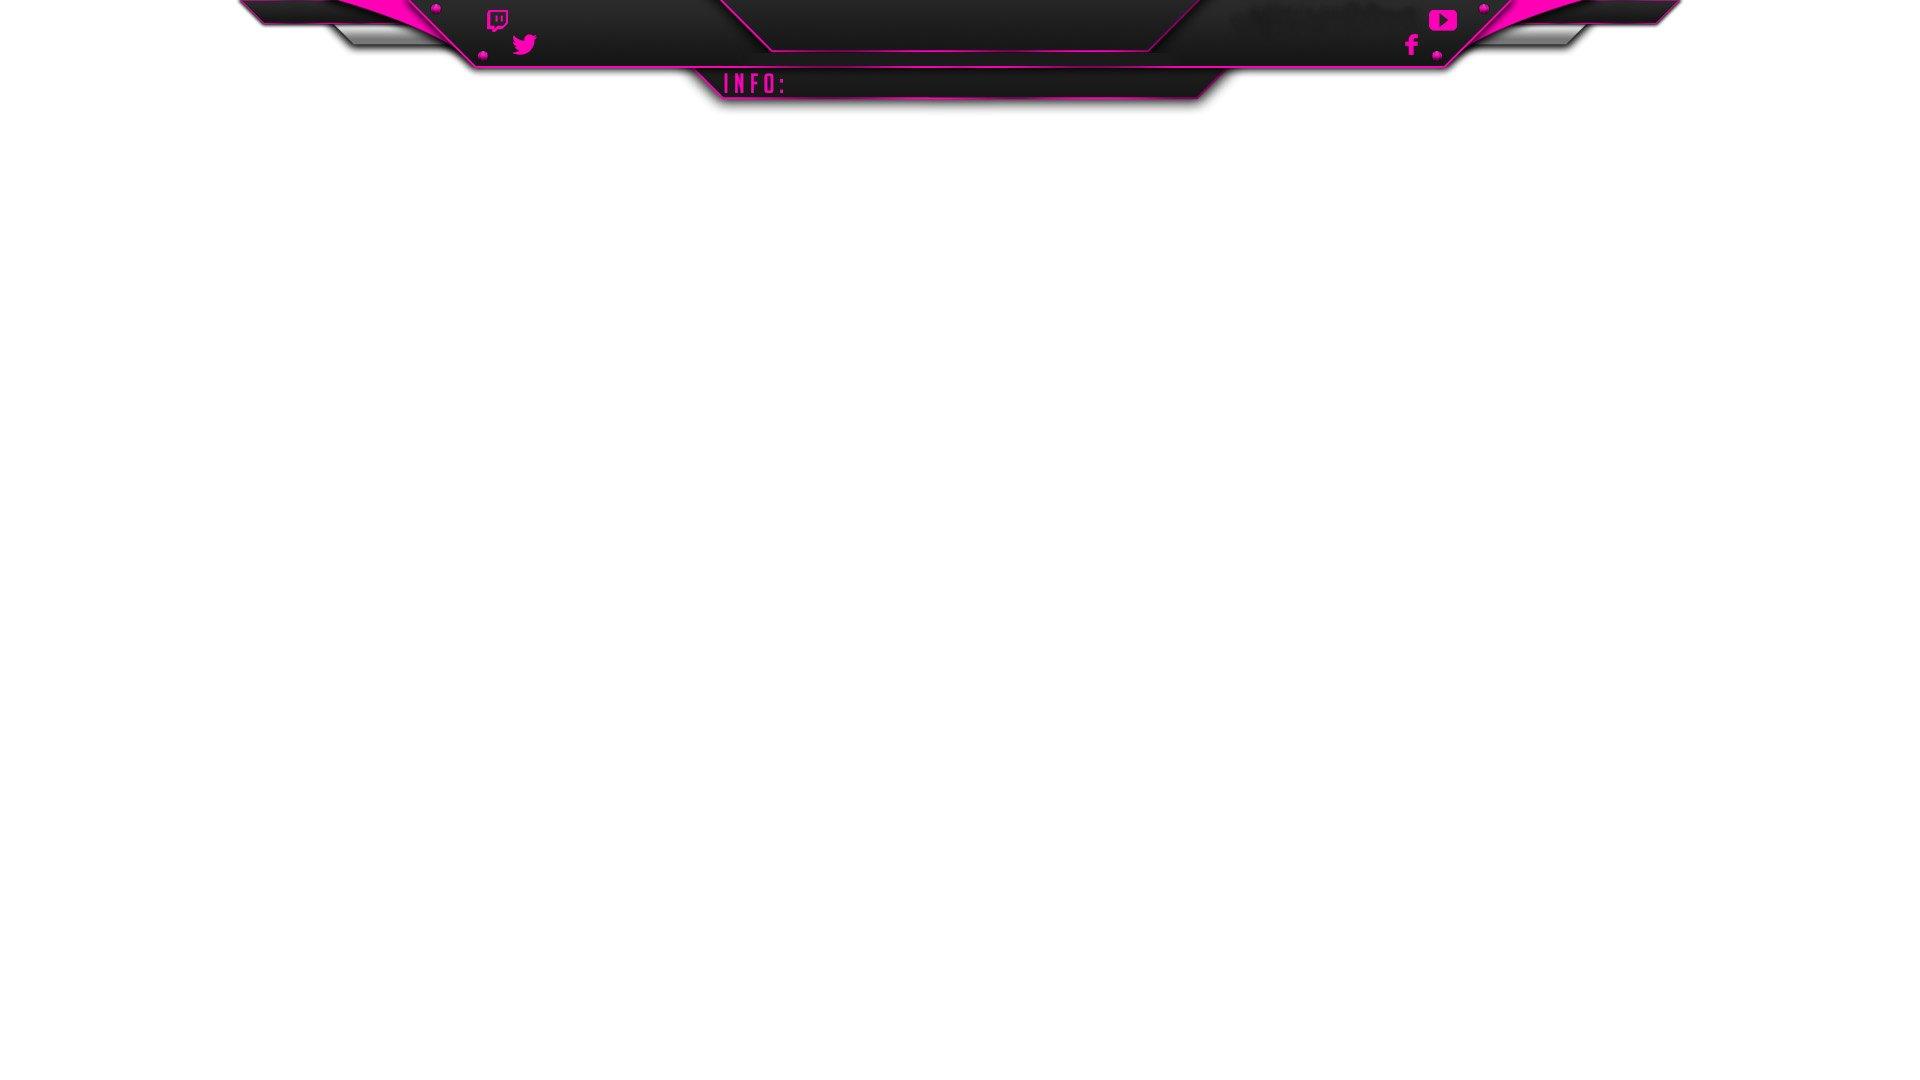 template overlay hitbox free